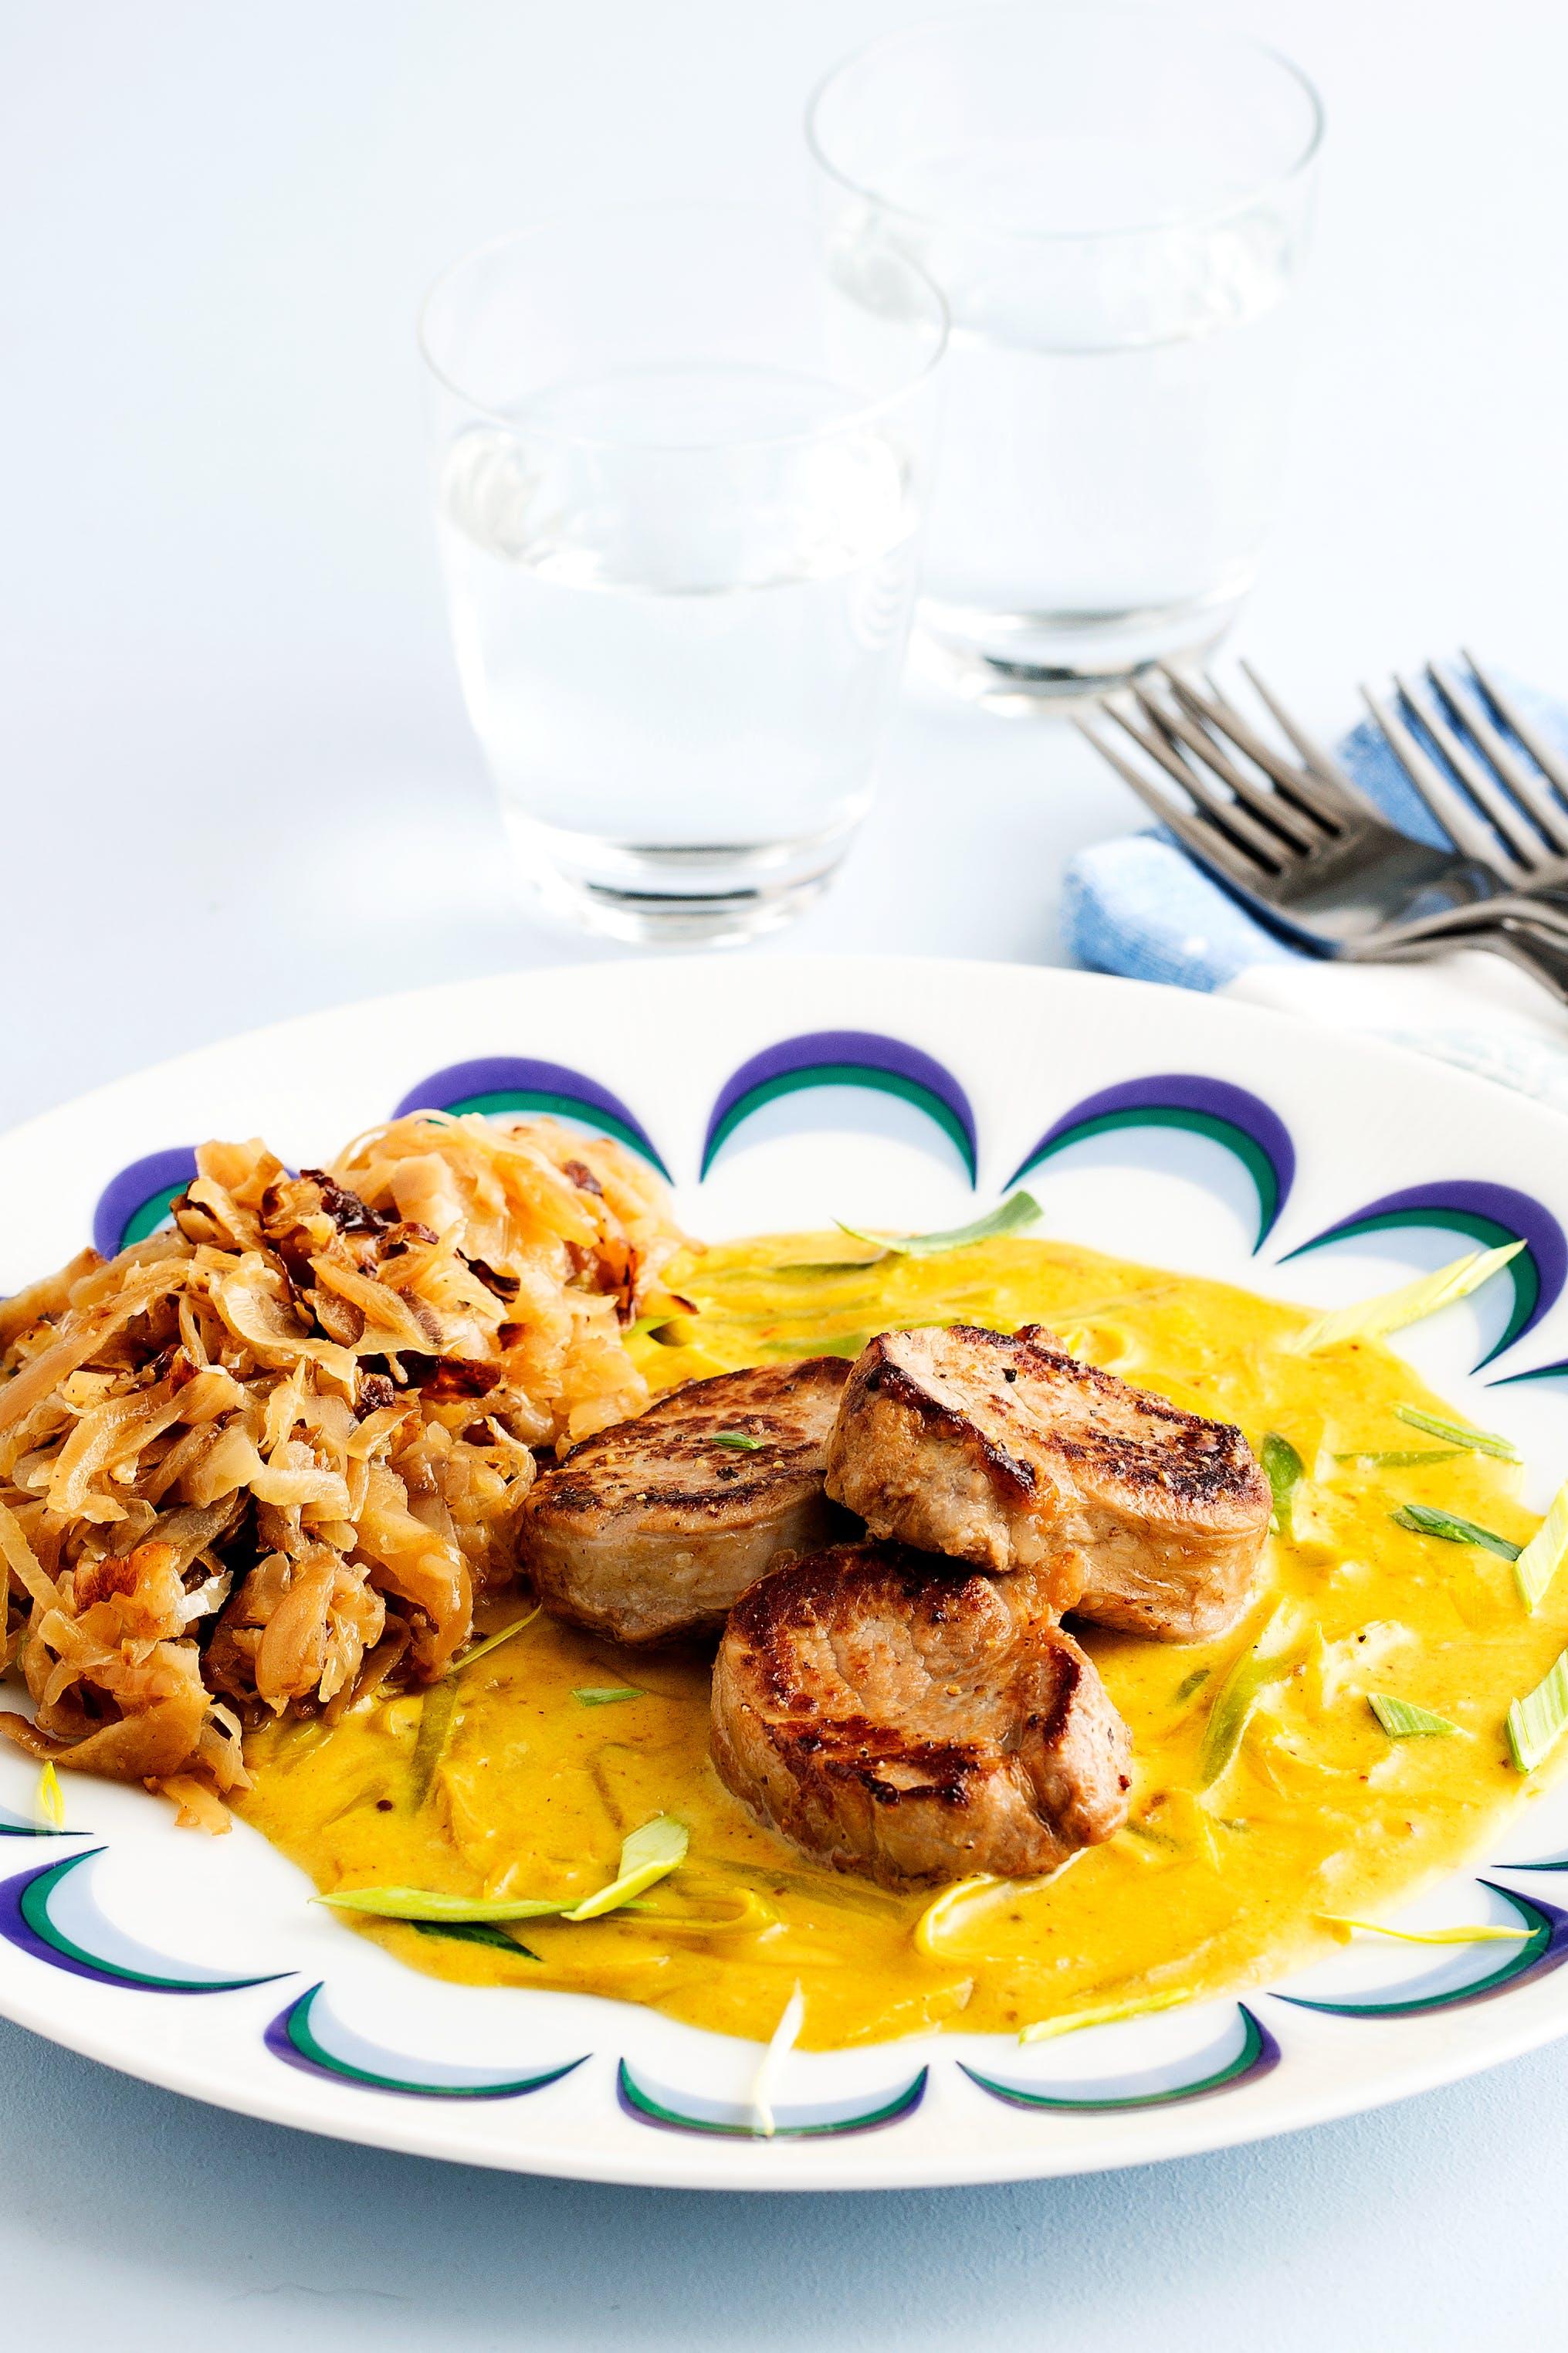 Pork tenderloin with curry sauce